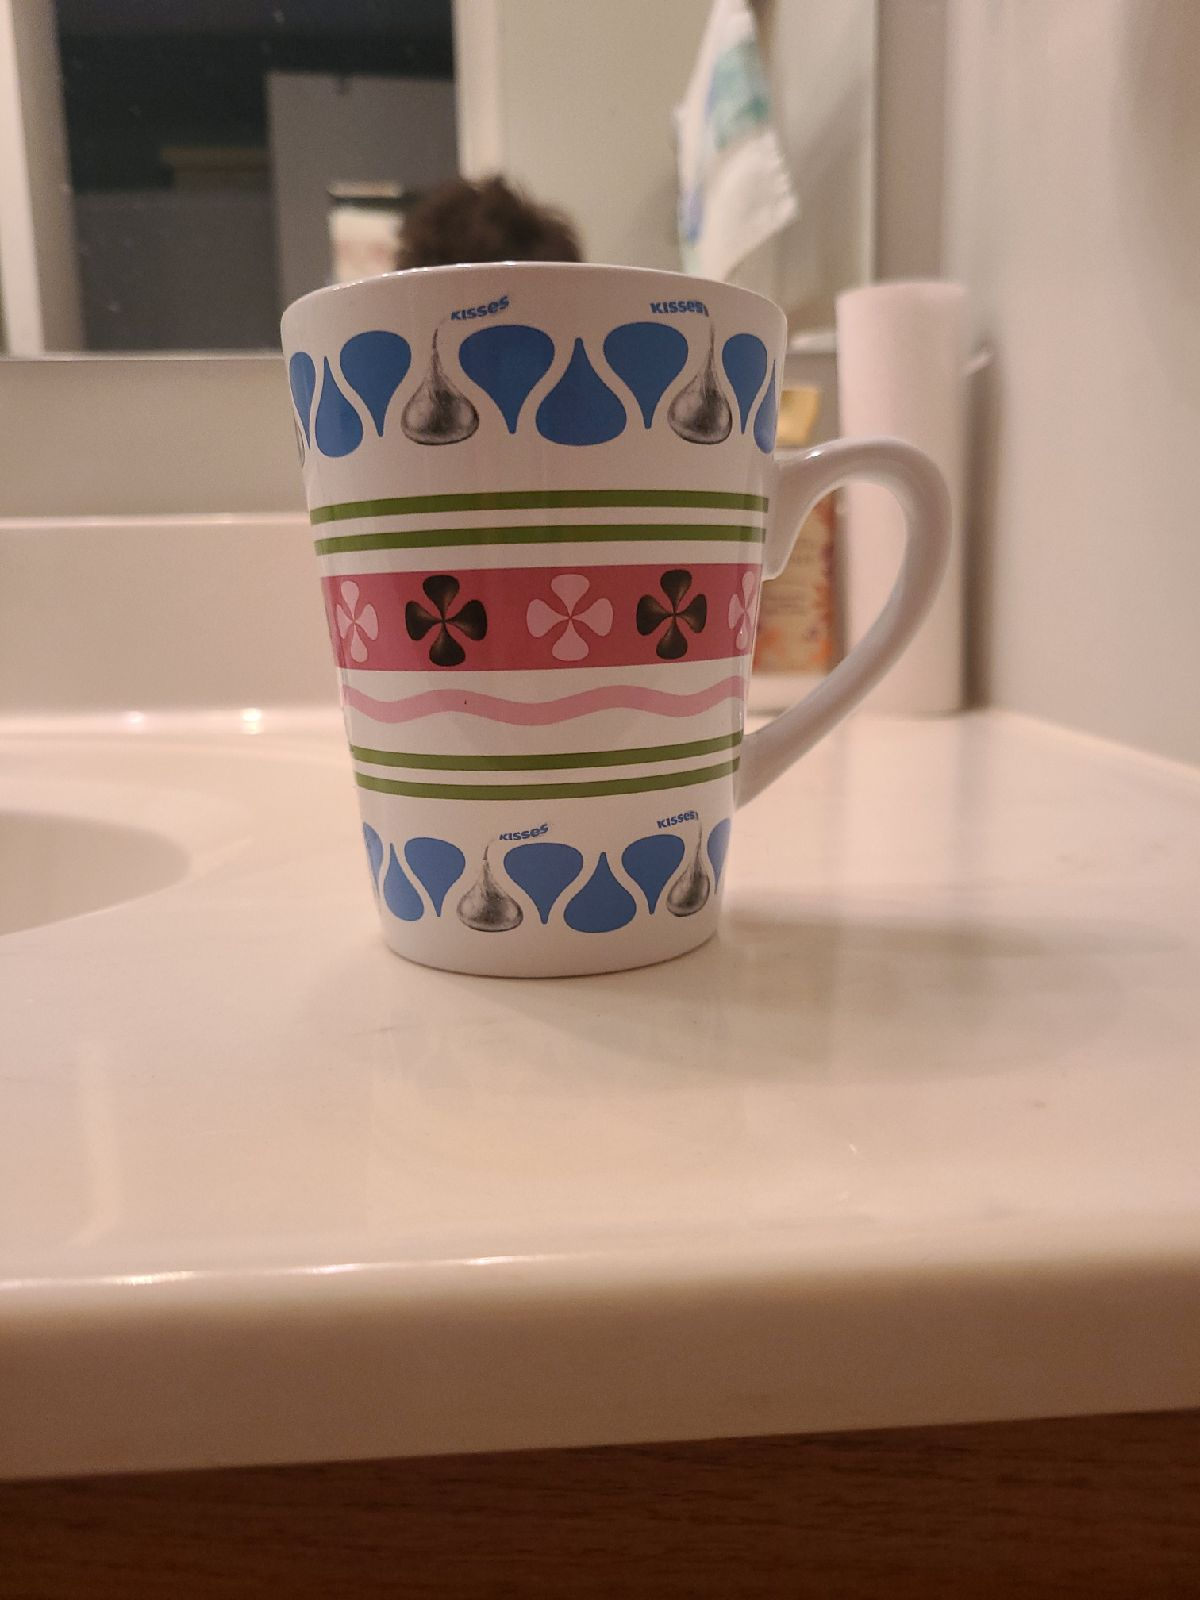 Hershey kisses mug